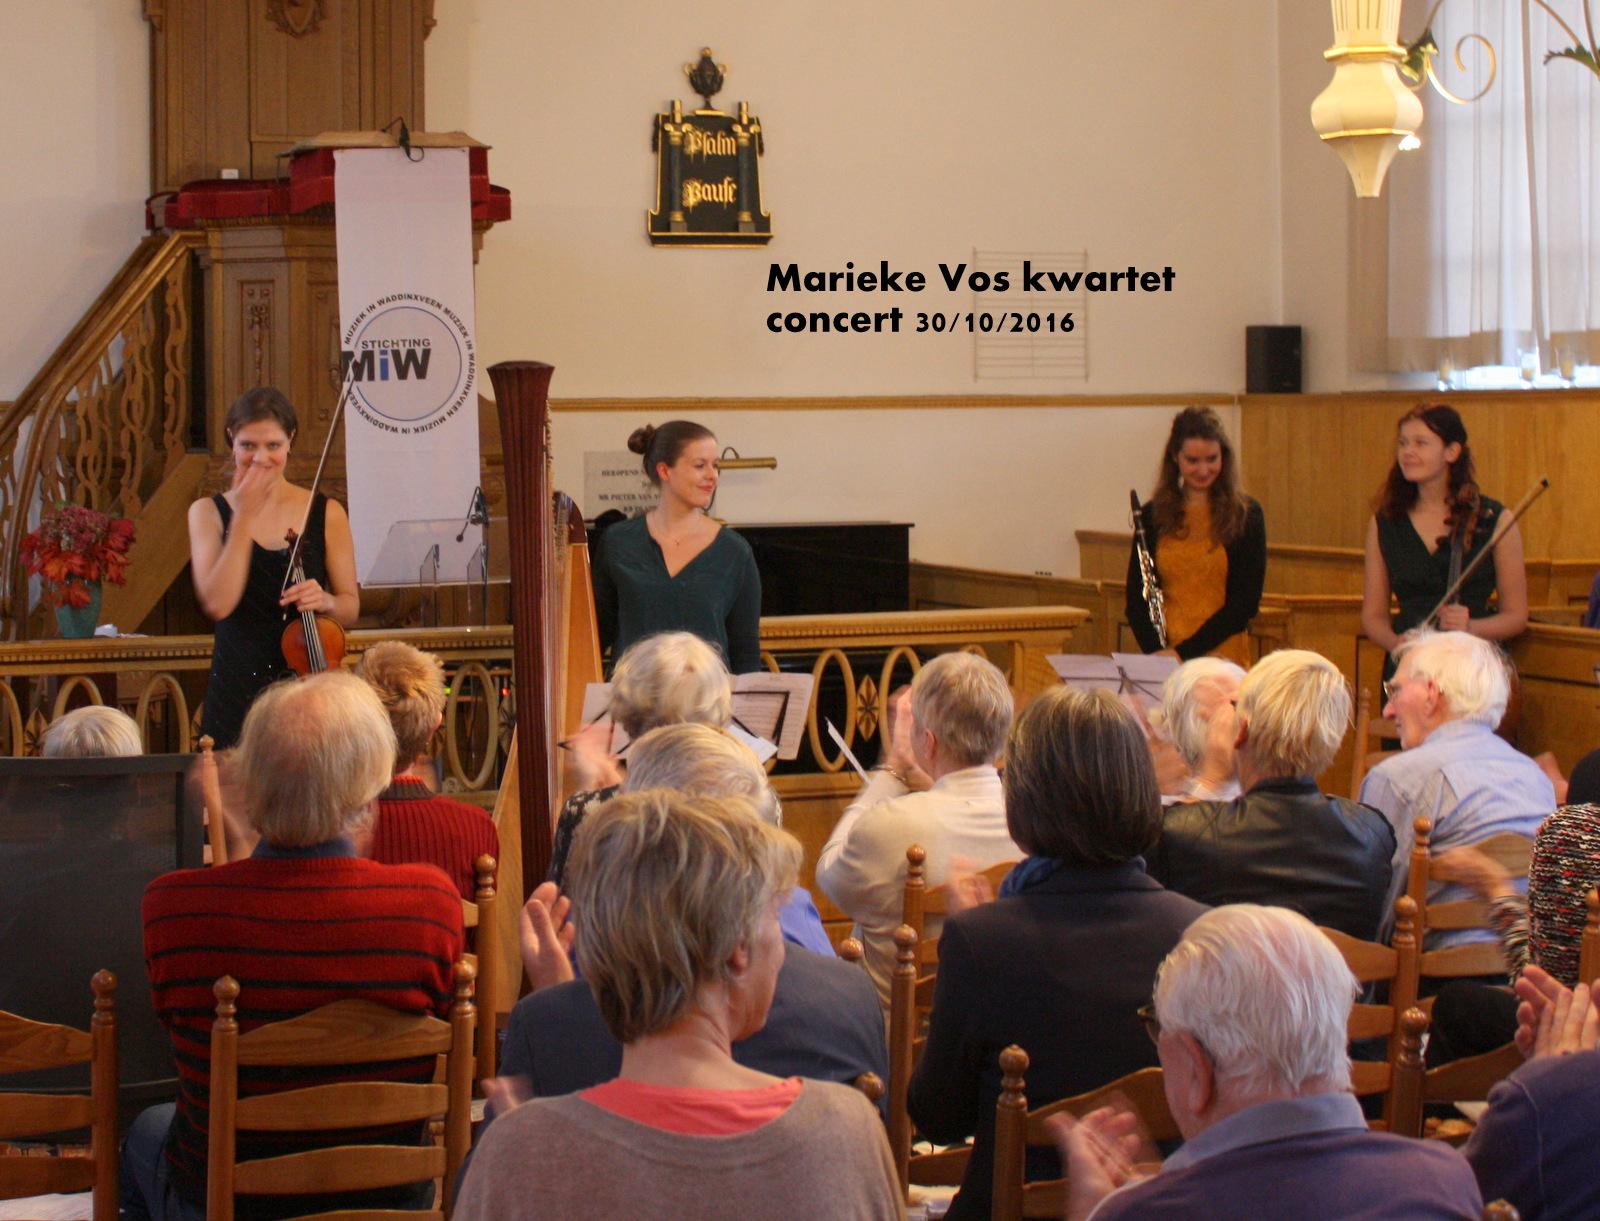 Marieke Vos Kwartet van 30 oktober 2016